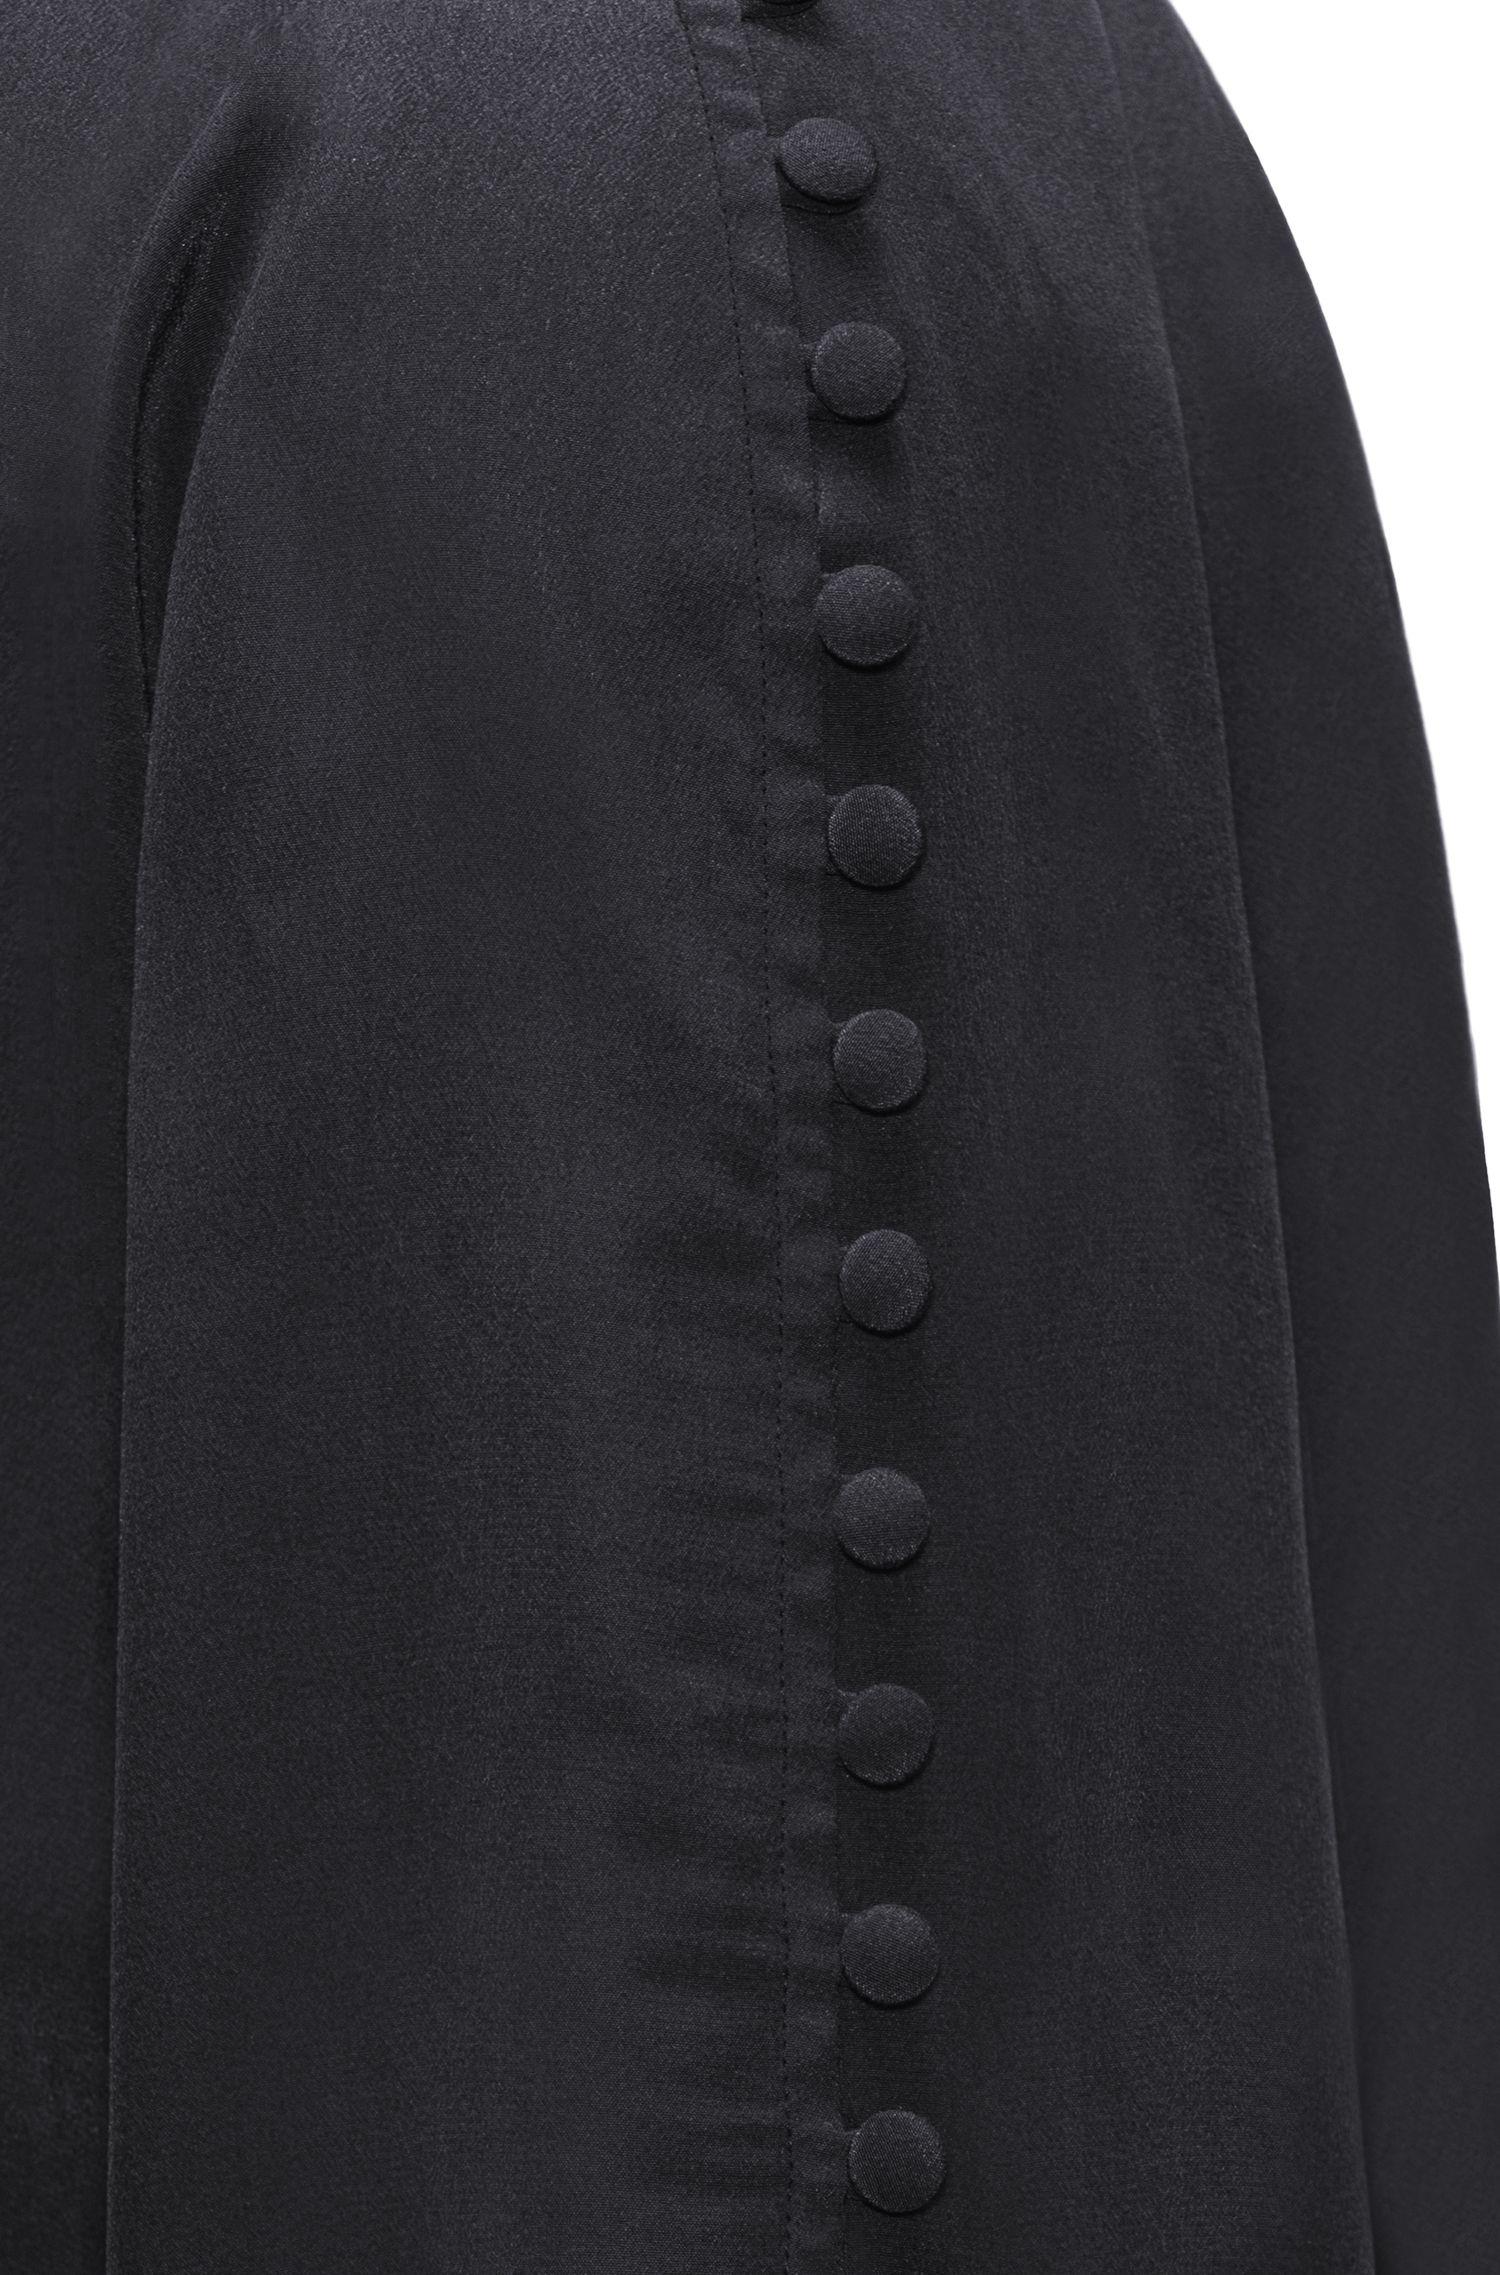 Buttoned Silk Blouse | Emitis, Black